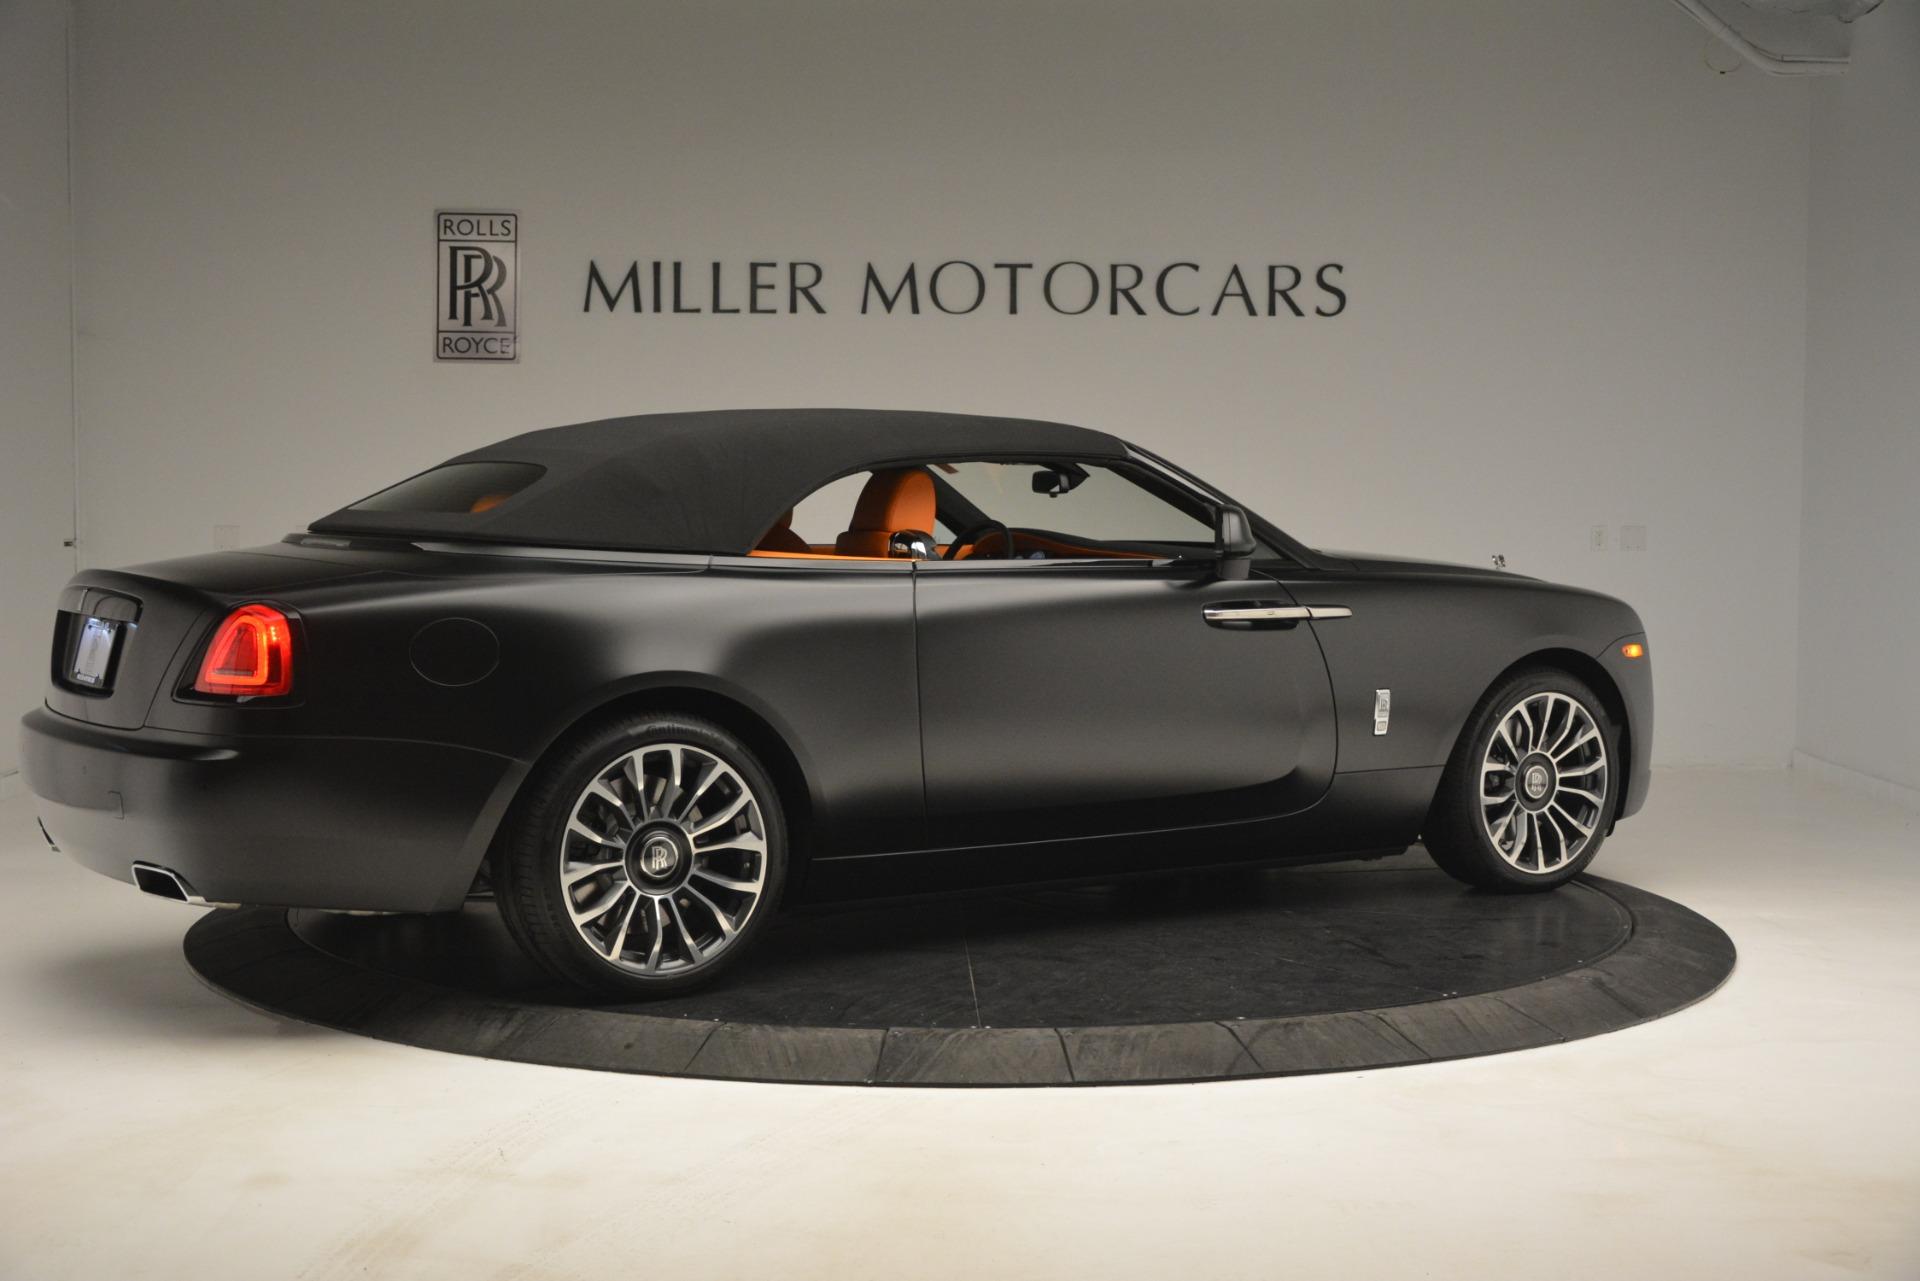 New 2019 Rolls-Royce Dawn  For Sale In Greenwich, CT 2695_p22